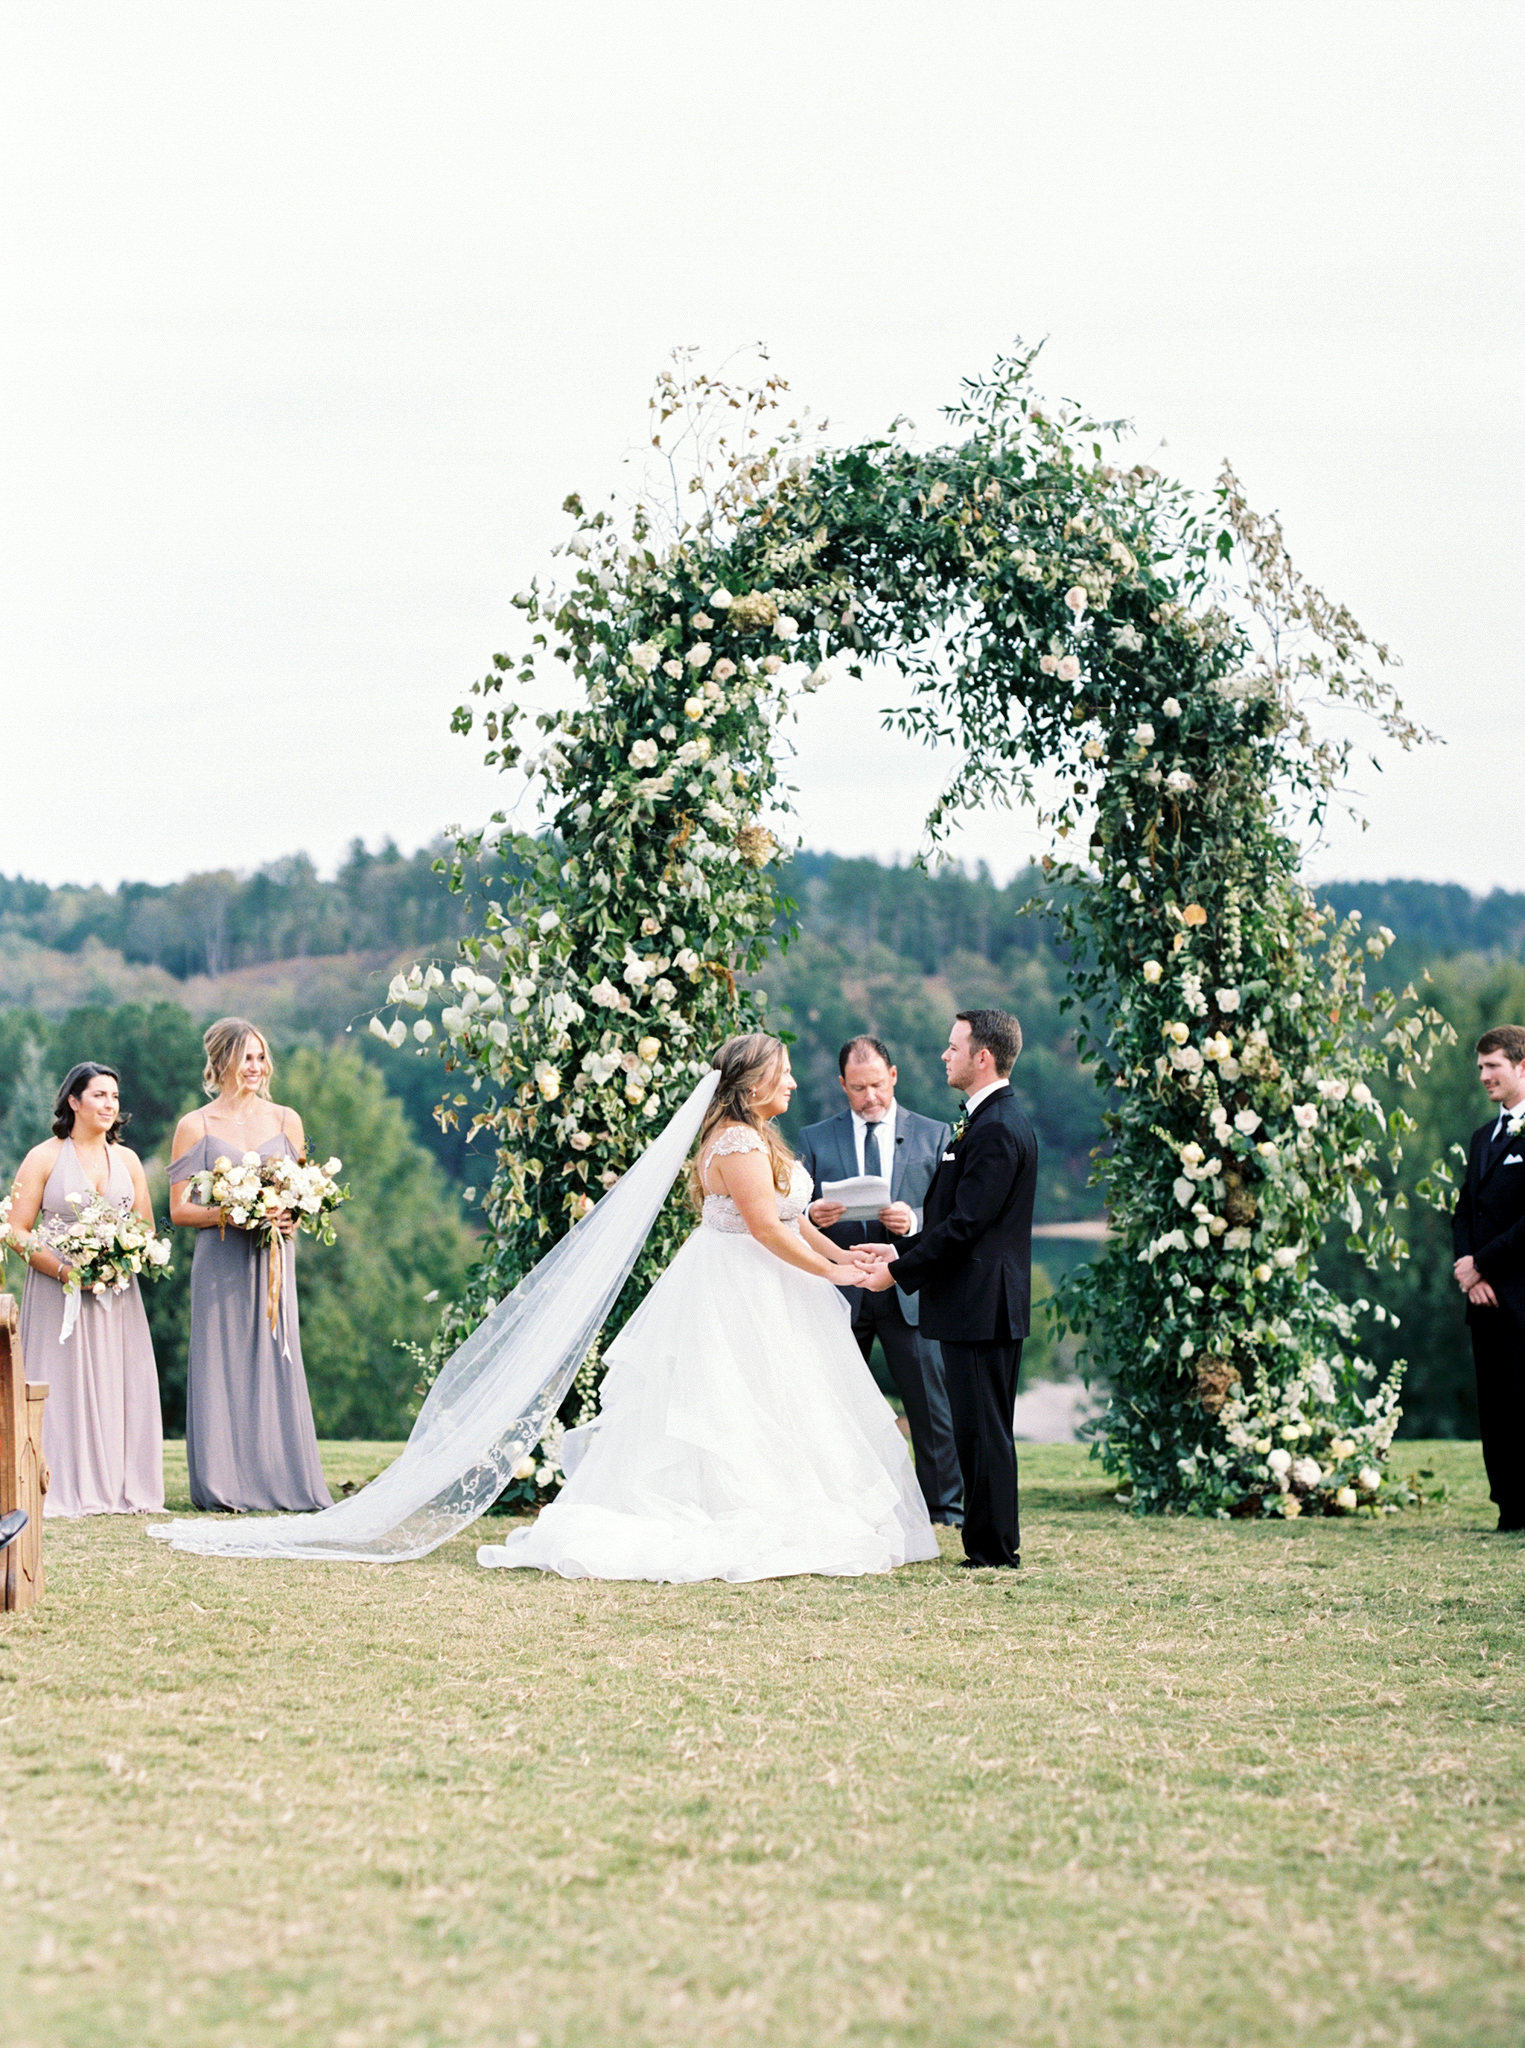 brittany alex wedding outdoor ceremony